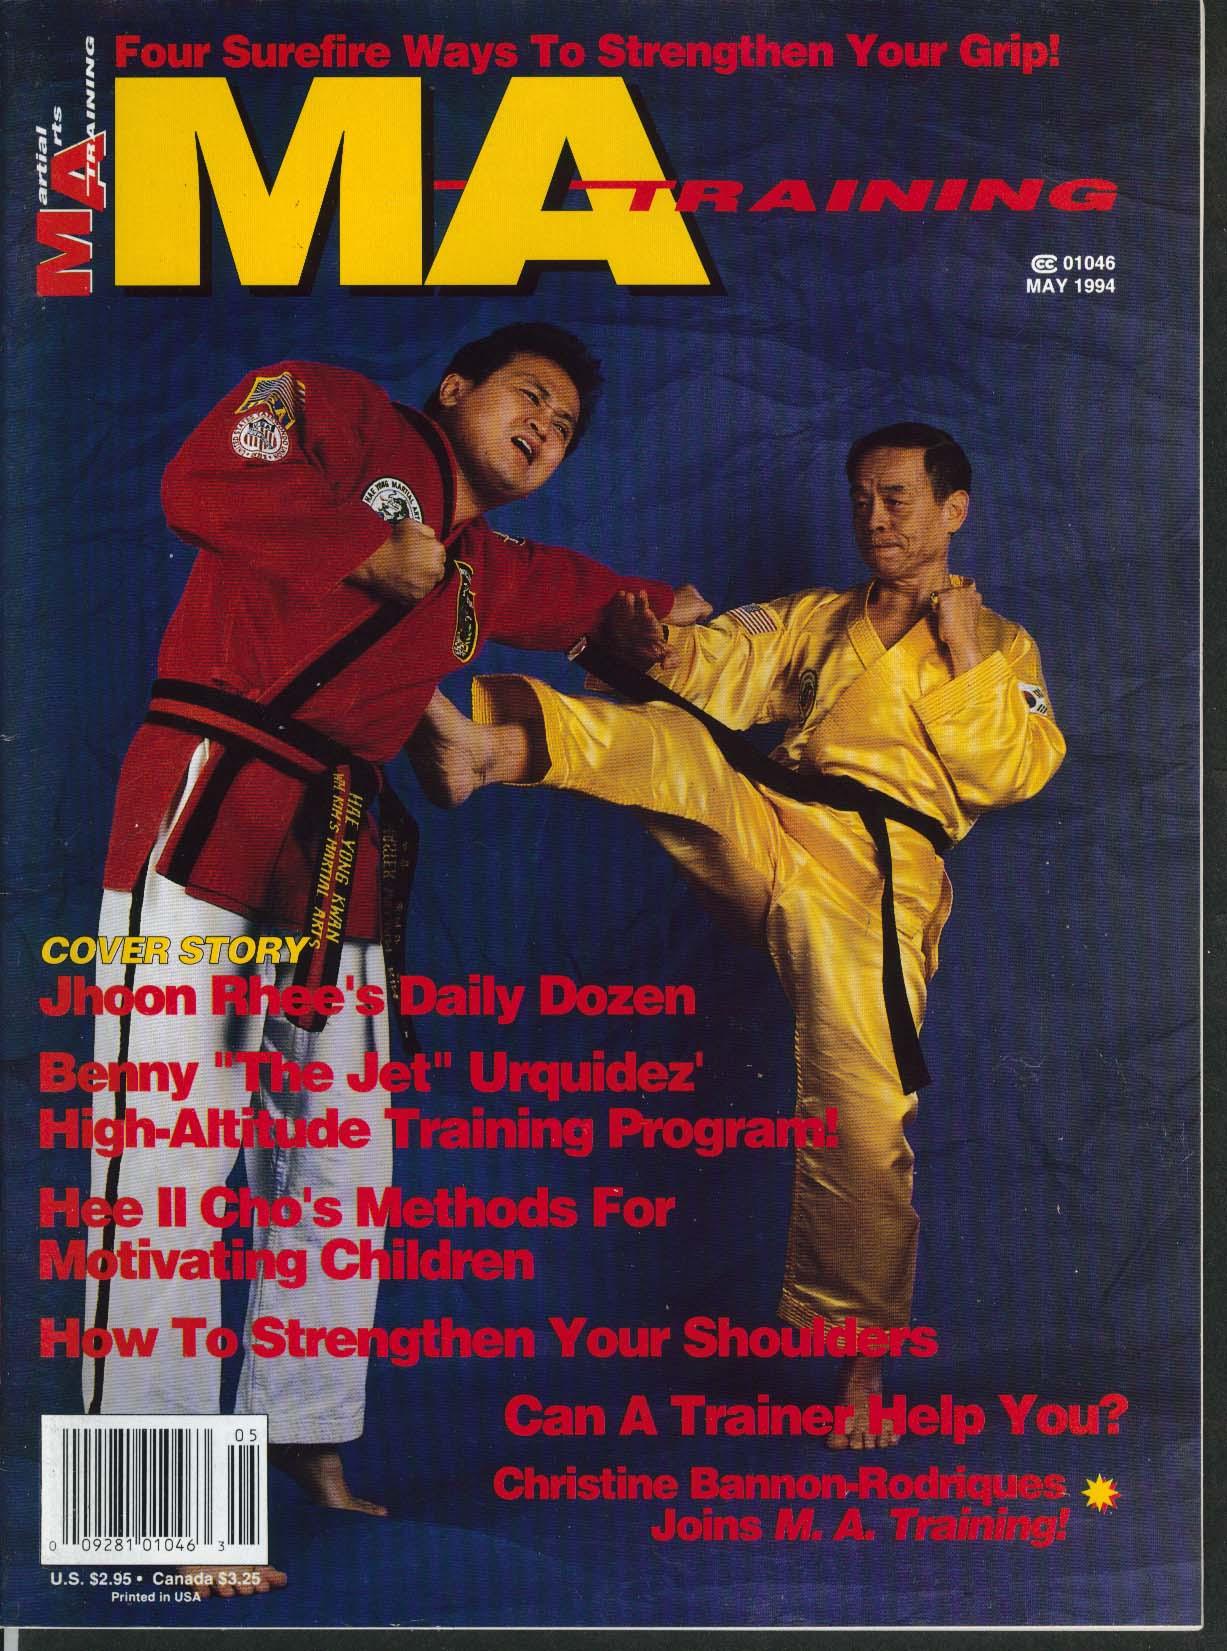 Image for MARTIAL ARTS MA TRAINING Jhoon Rhee Benny Urquidez Hee Il Cho ++ 5 1994